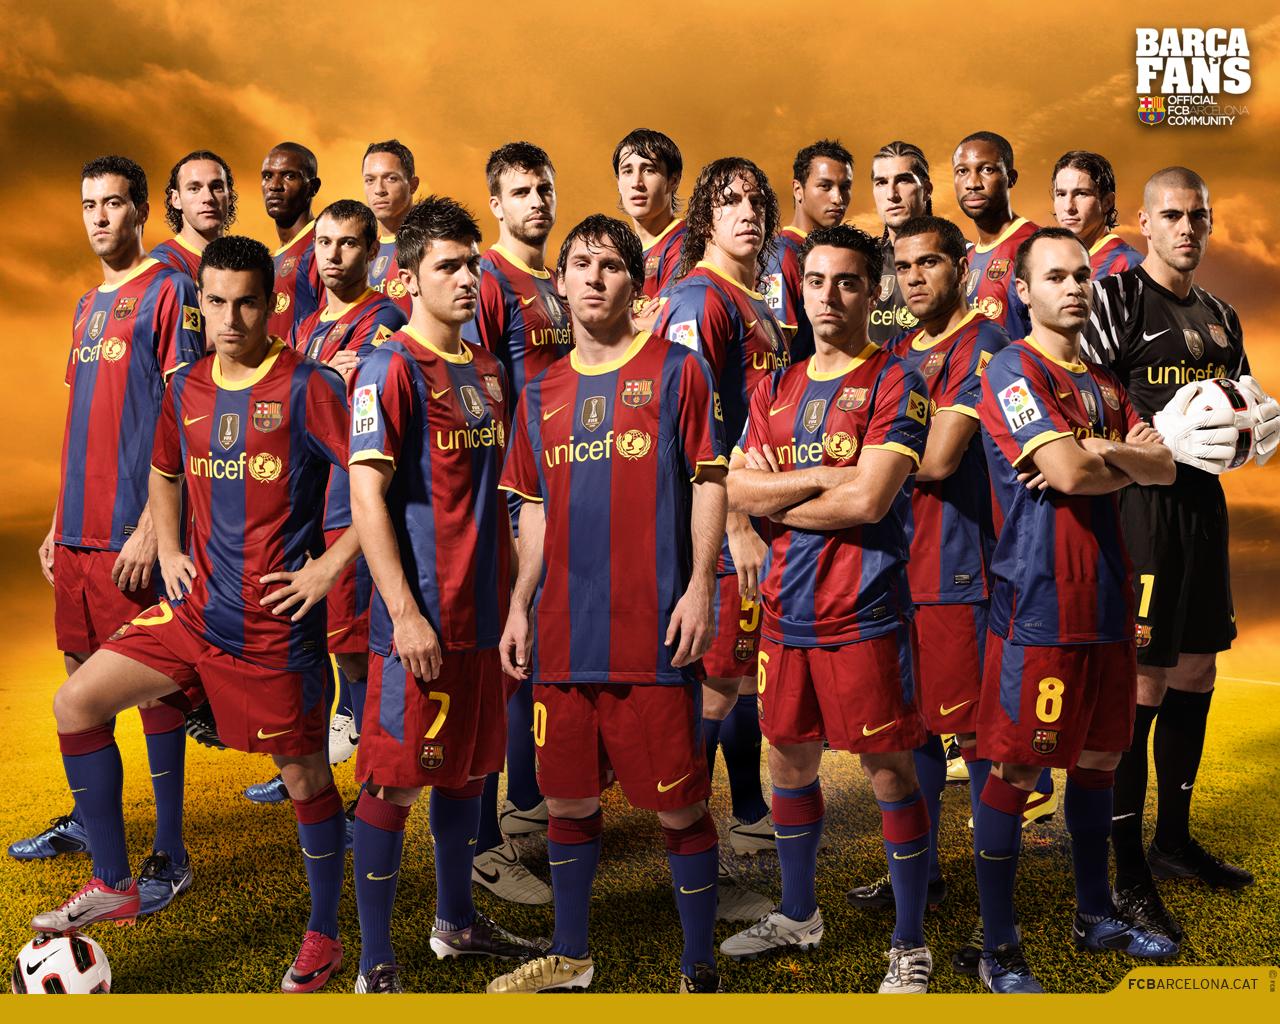 Barcelona Fc: Barca Funny Gallery